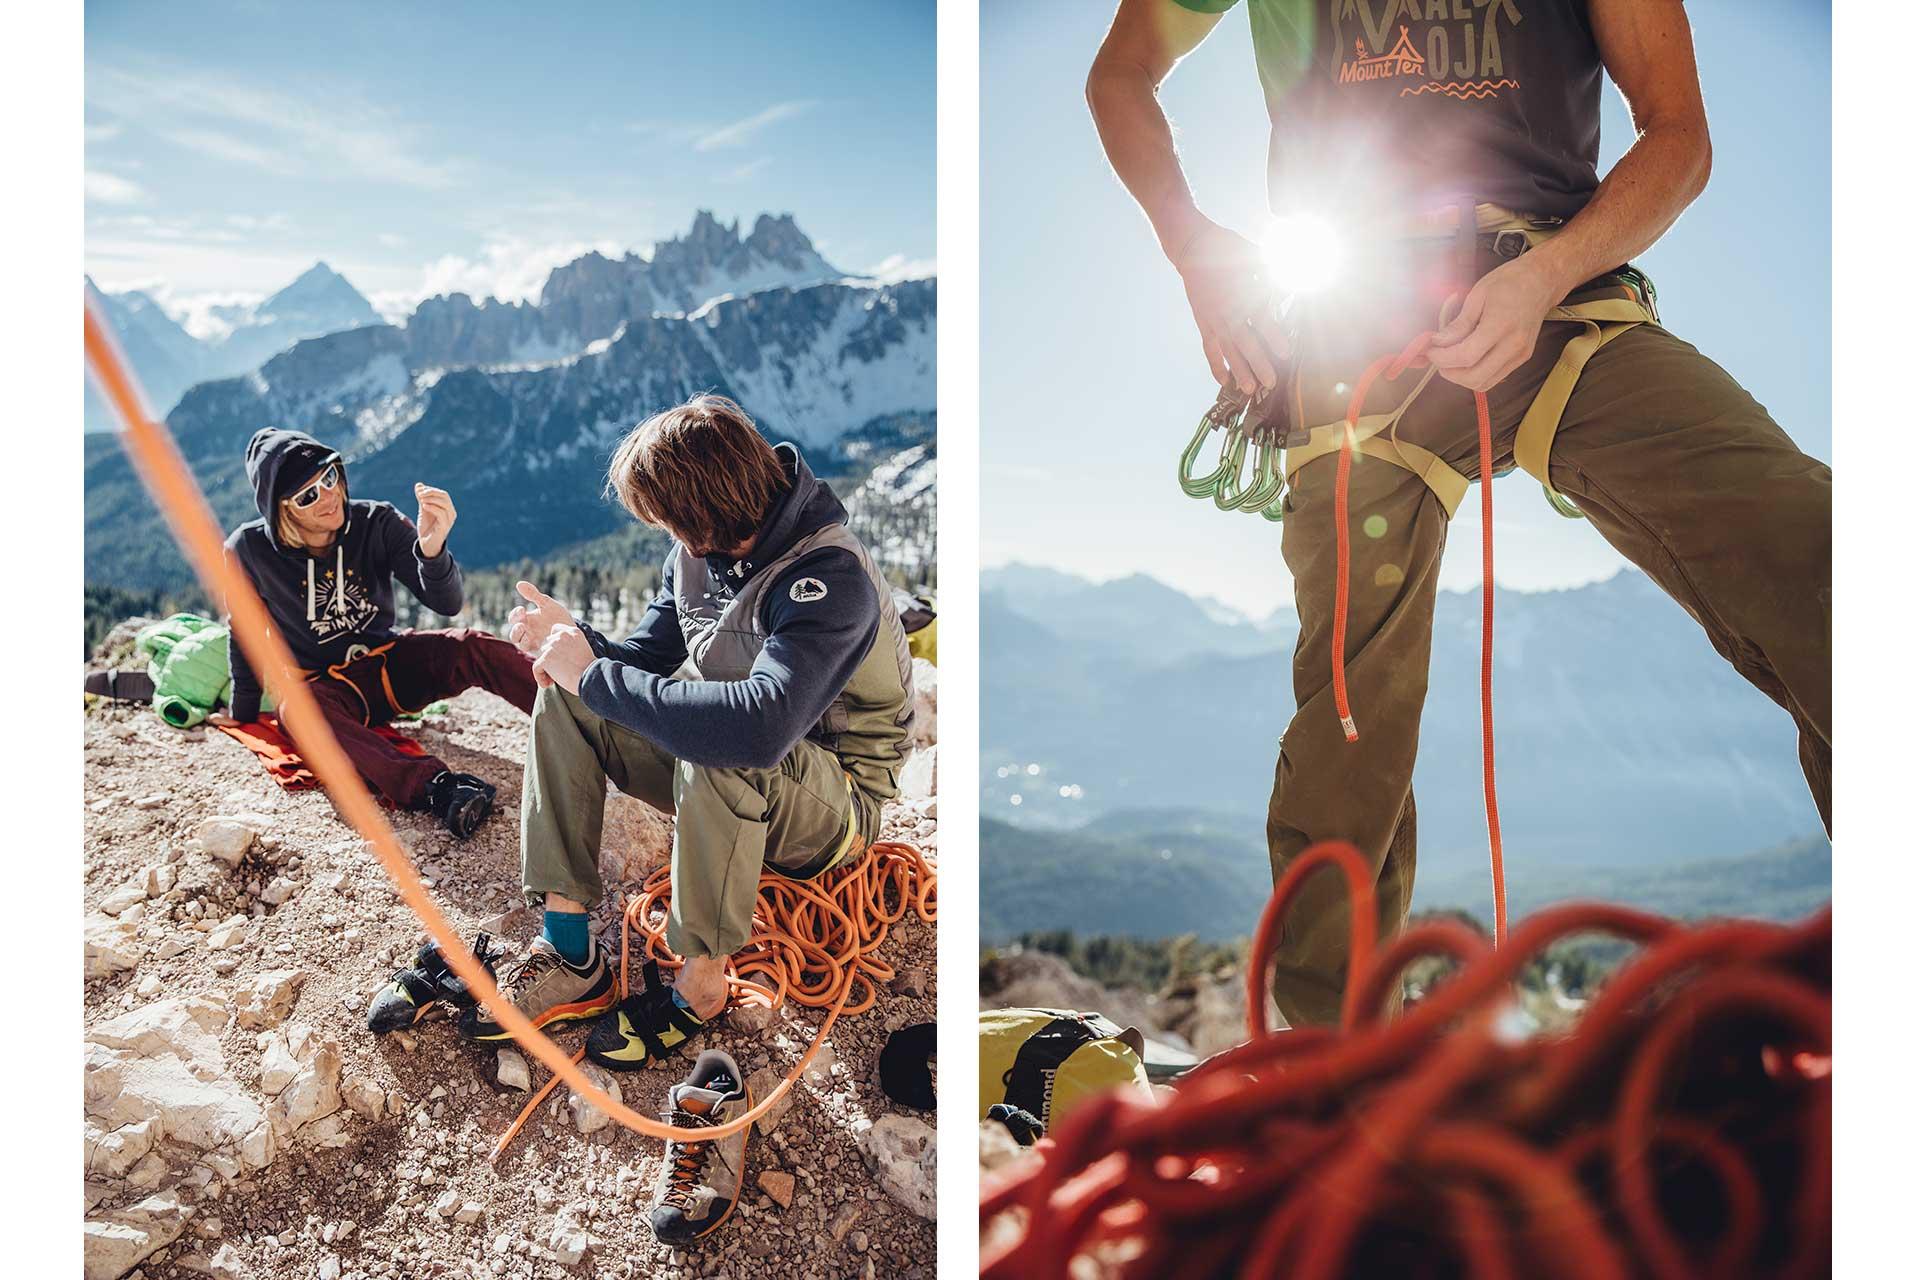 Sport Klettern Fotograf Outdoor Katalog Frankfurt Europa Michael Müller